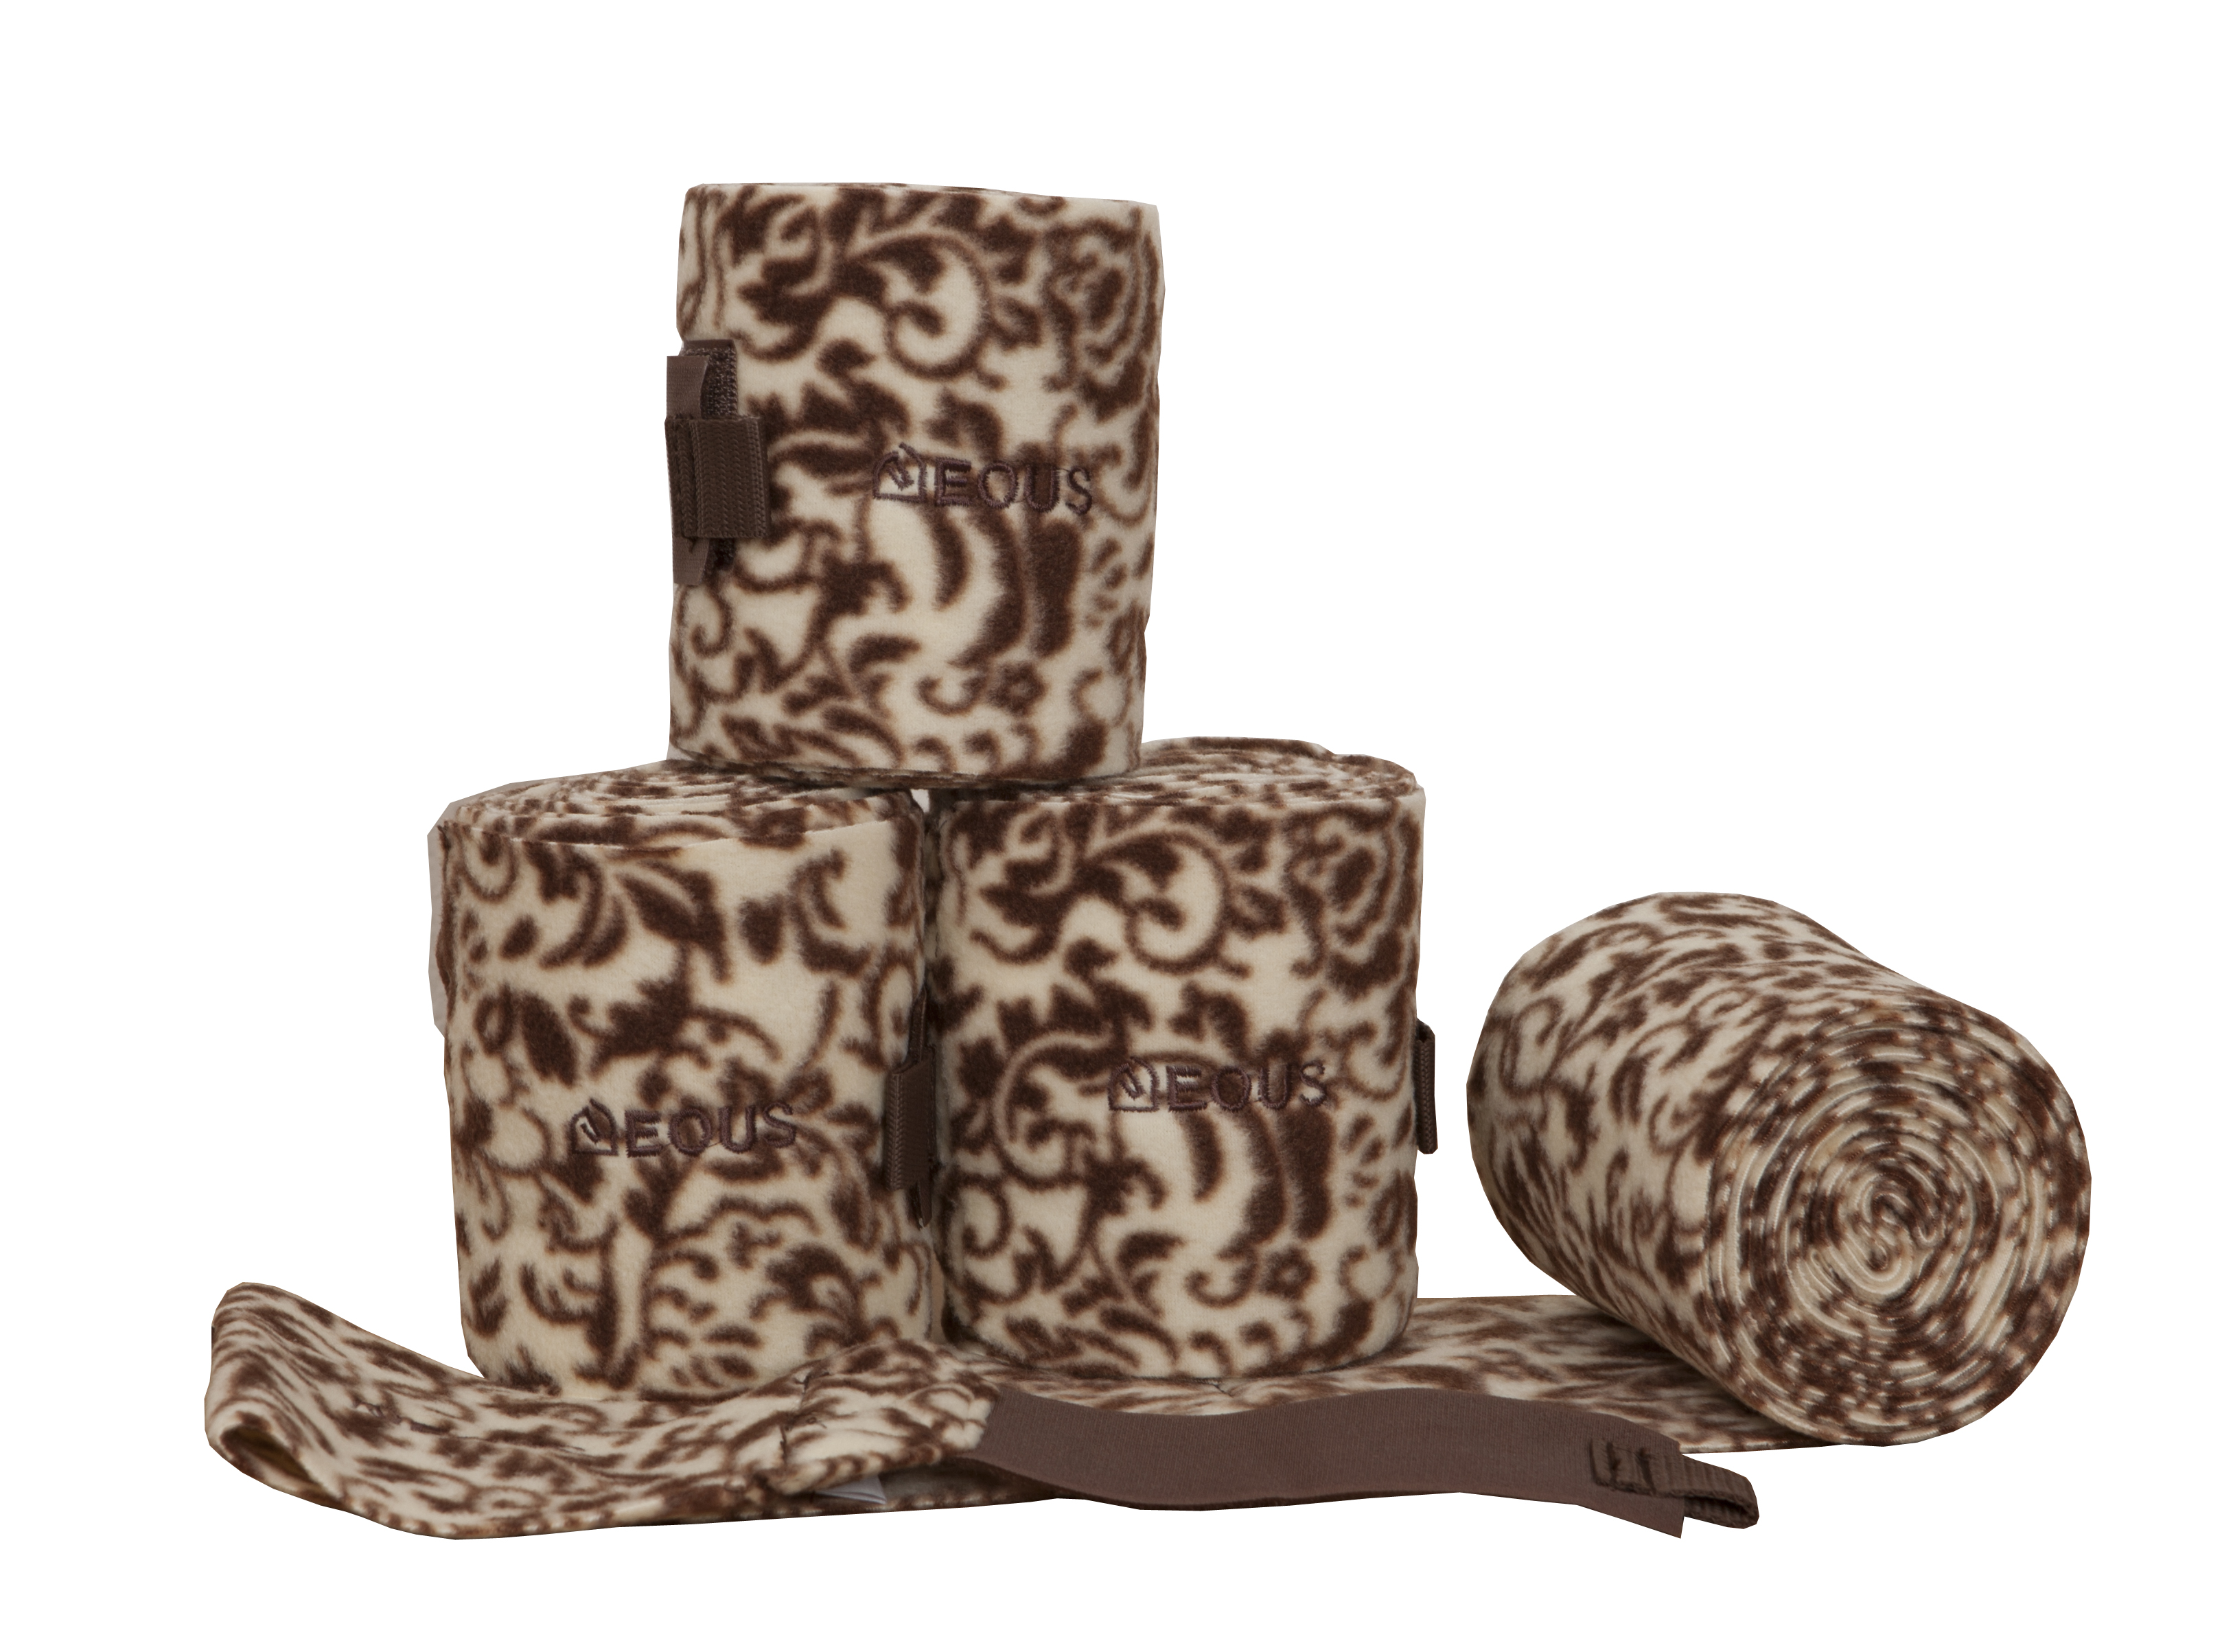 EOUS Polo Wraps - Brown Floral